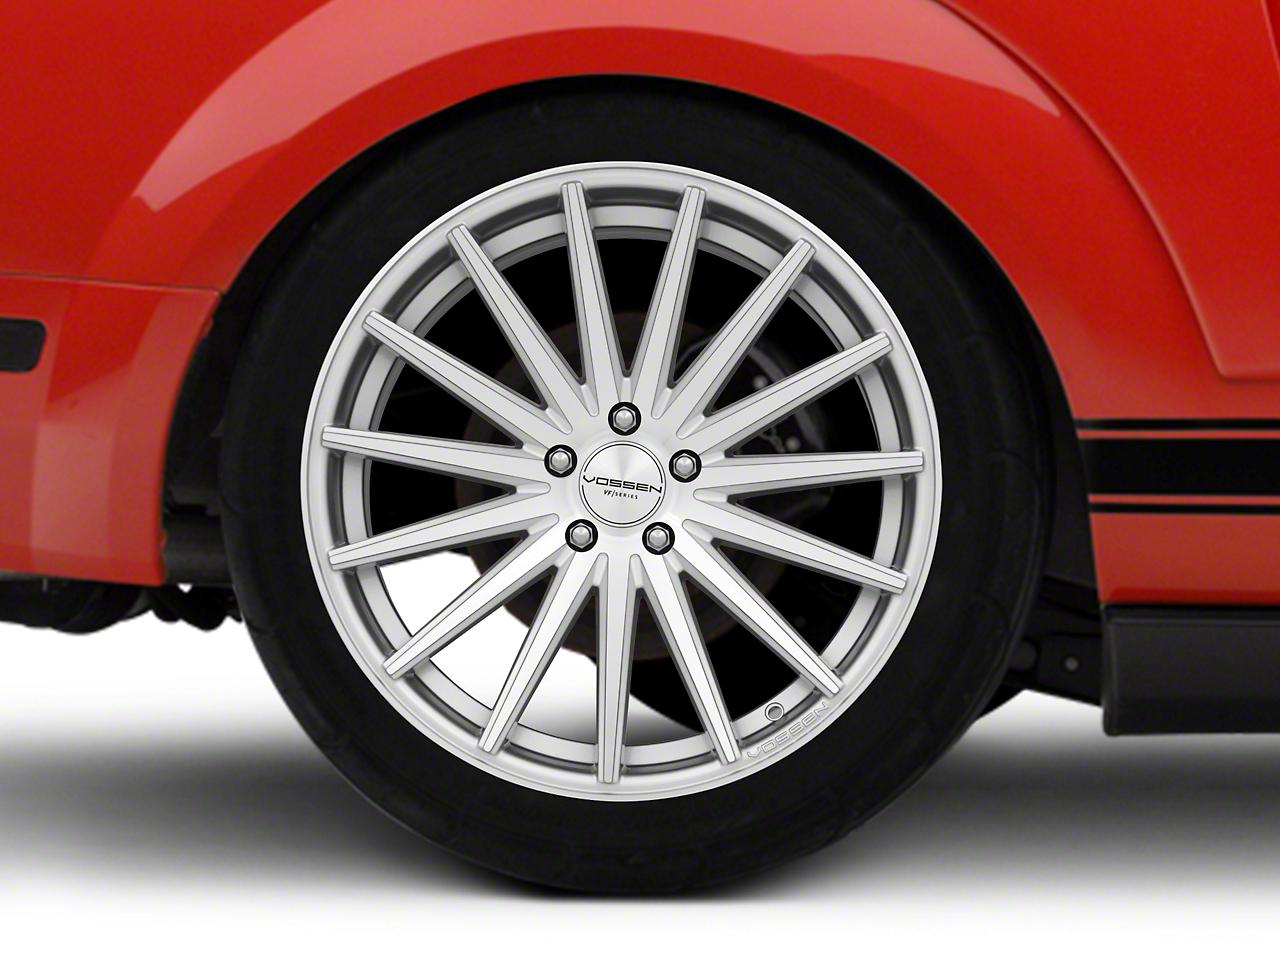 Vossen VFS/2 Silver Polished Wheel - 20x10.5 (05-14 All)